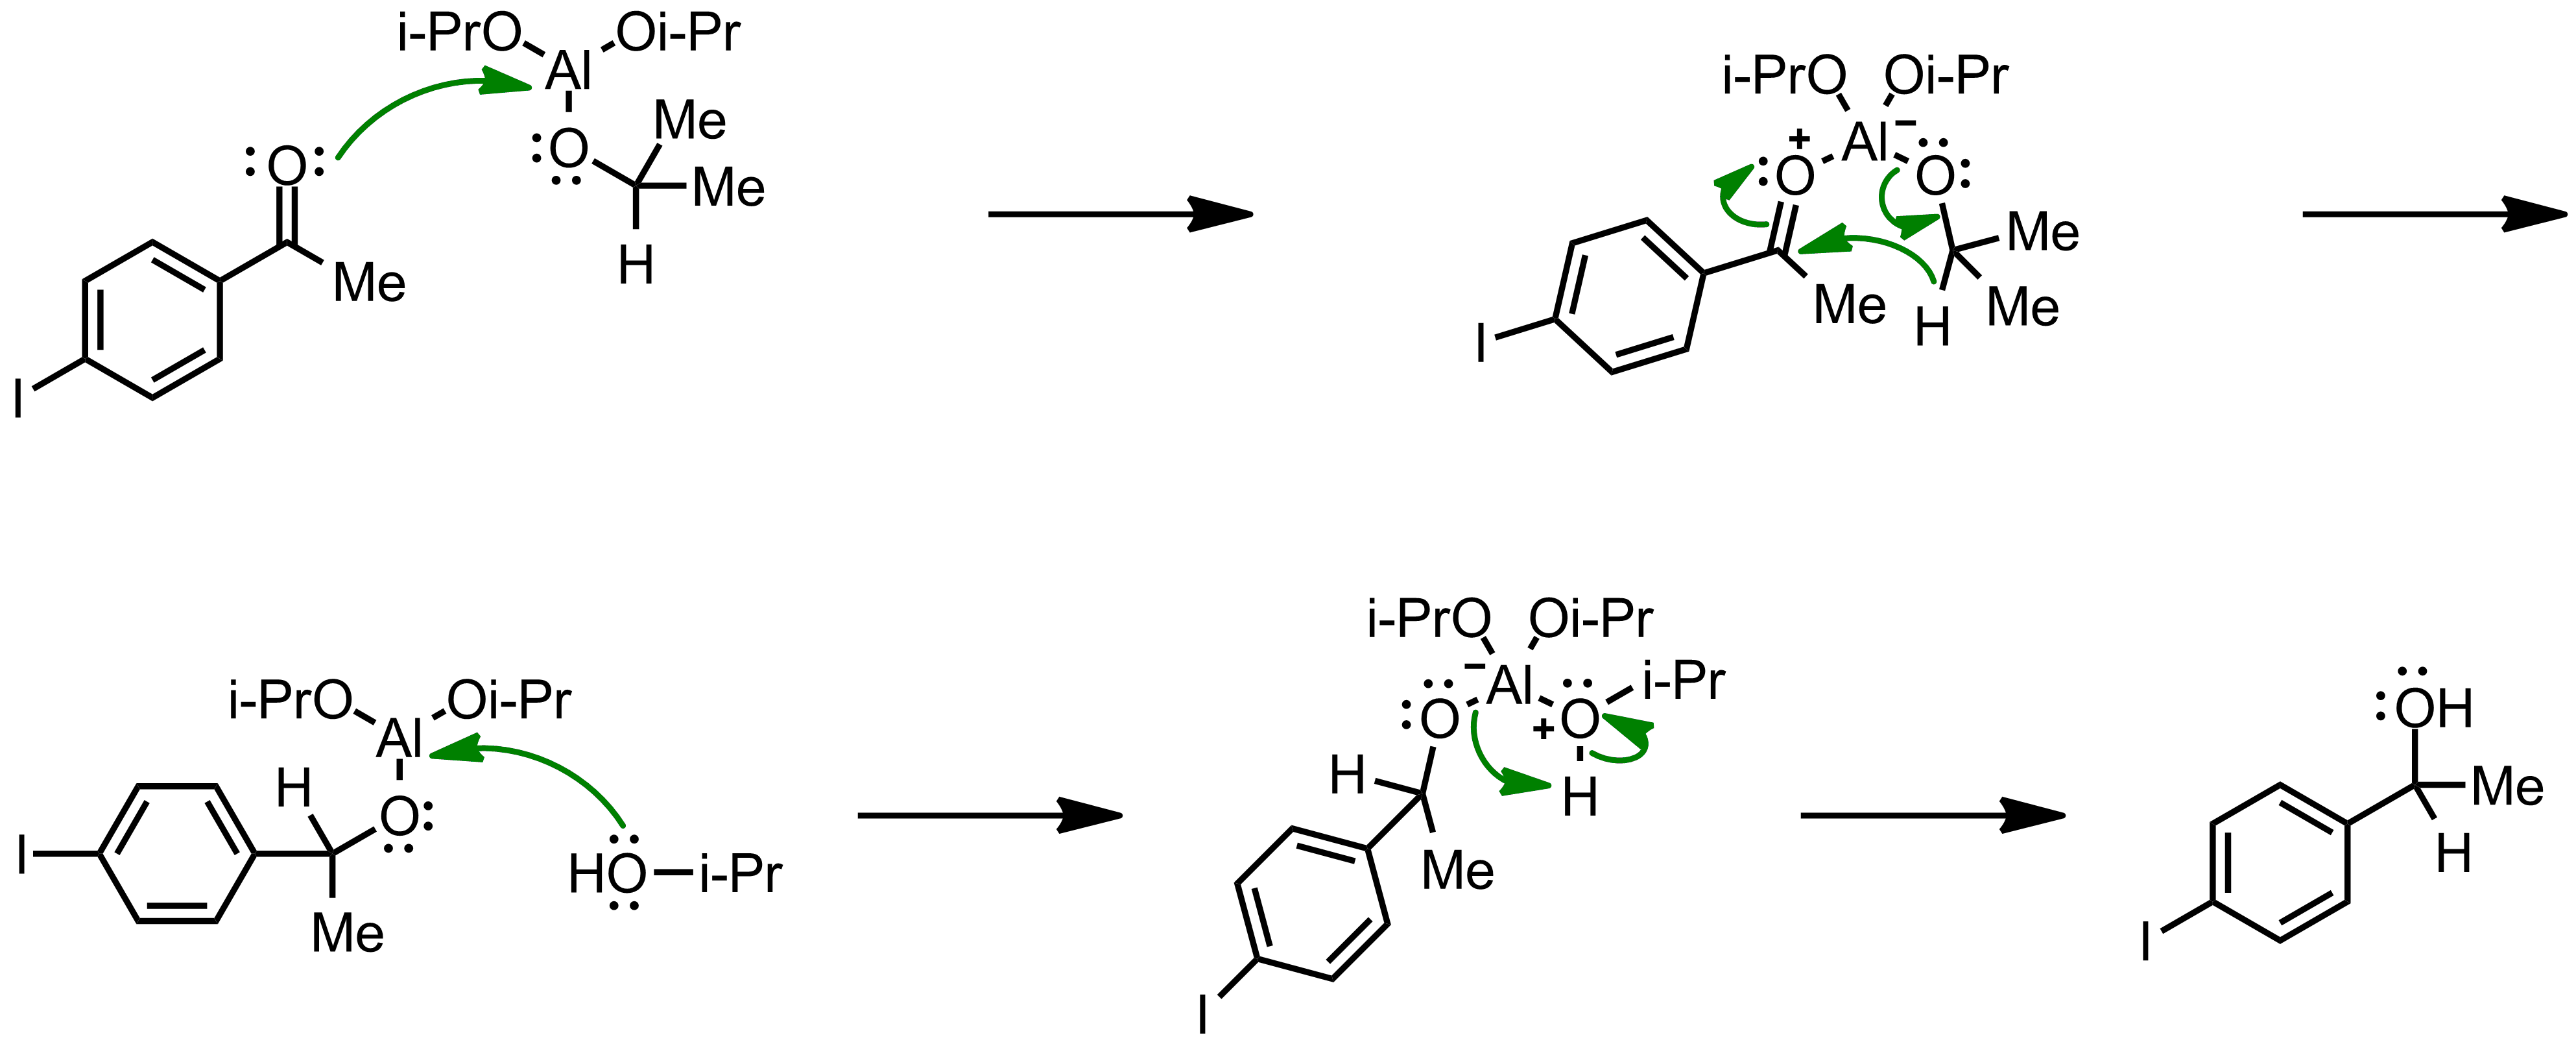 Mechanism of the Meerwein-Ponndorf-Verley Reduction